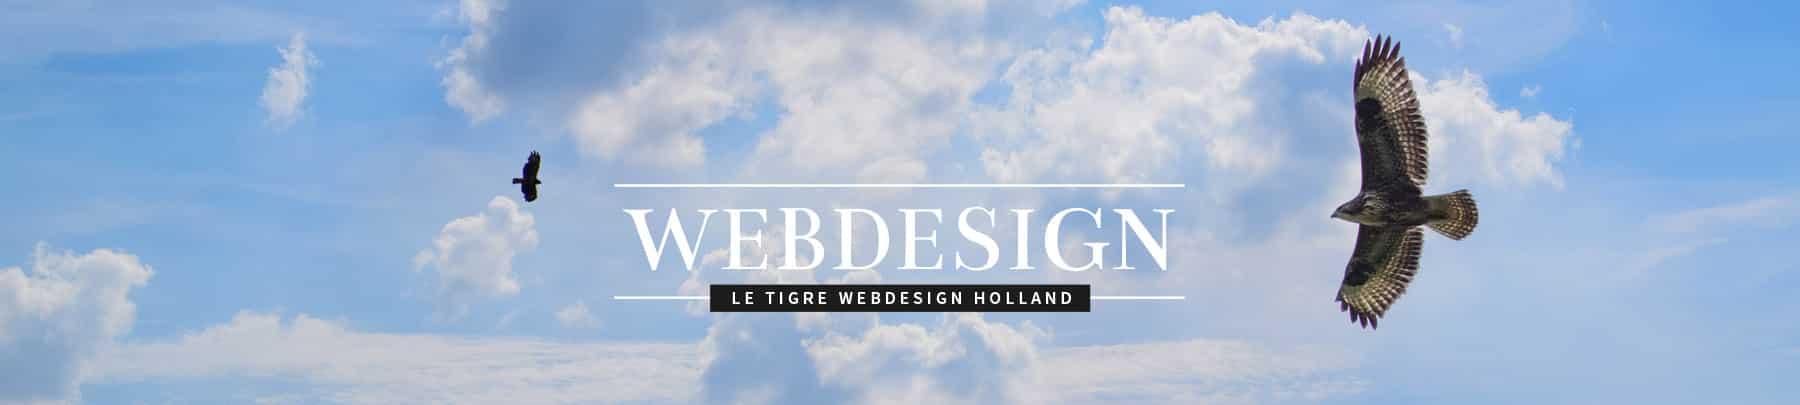 Webdesign Holland - Responsive websites met CMS